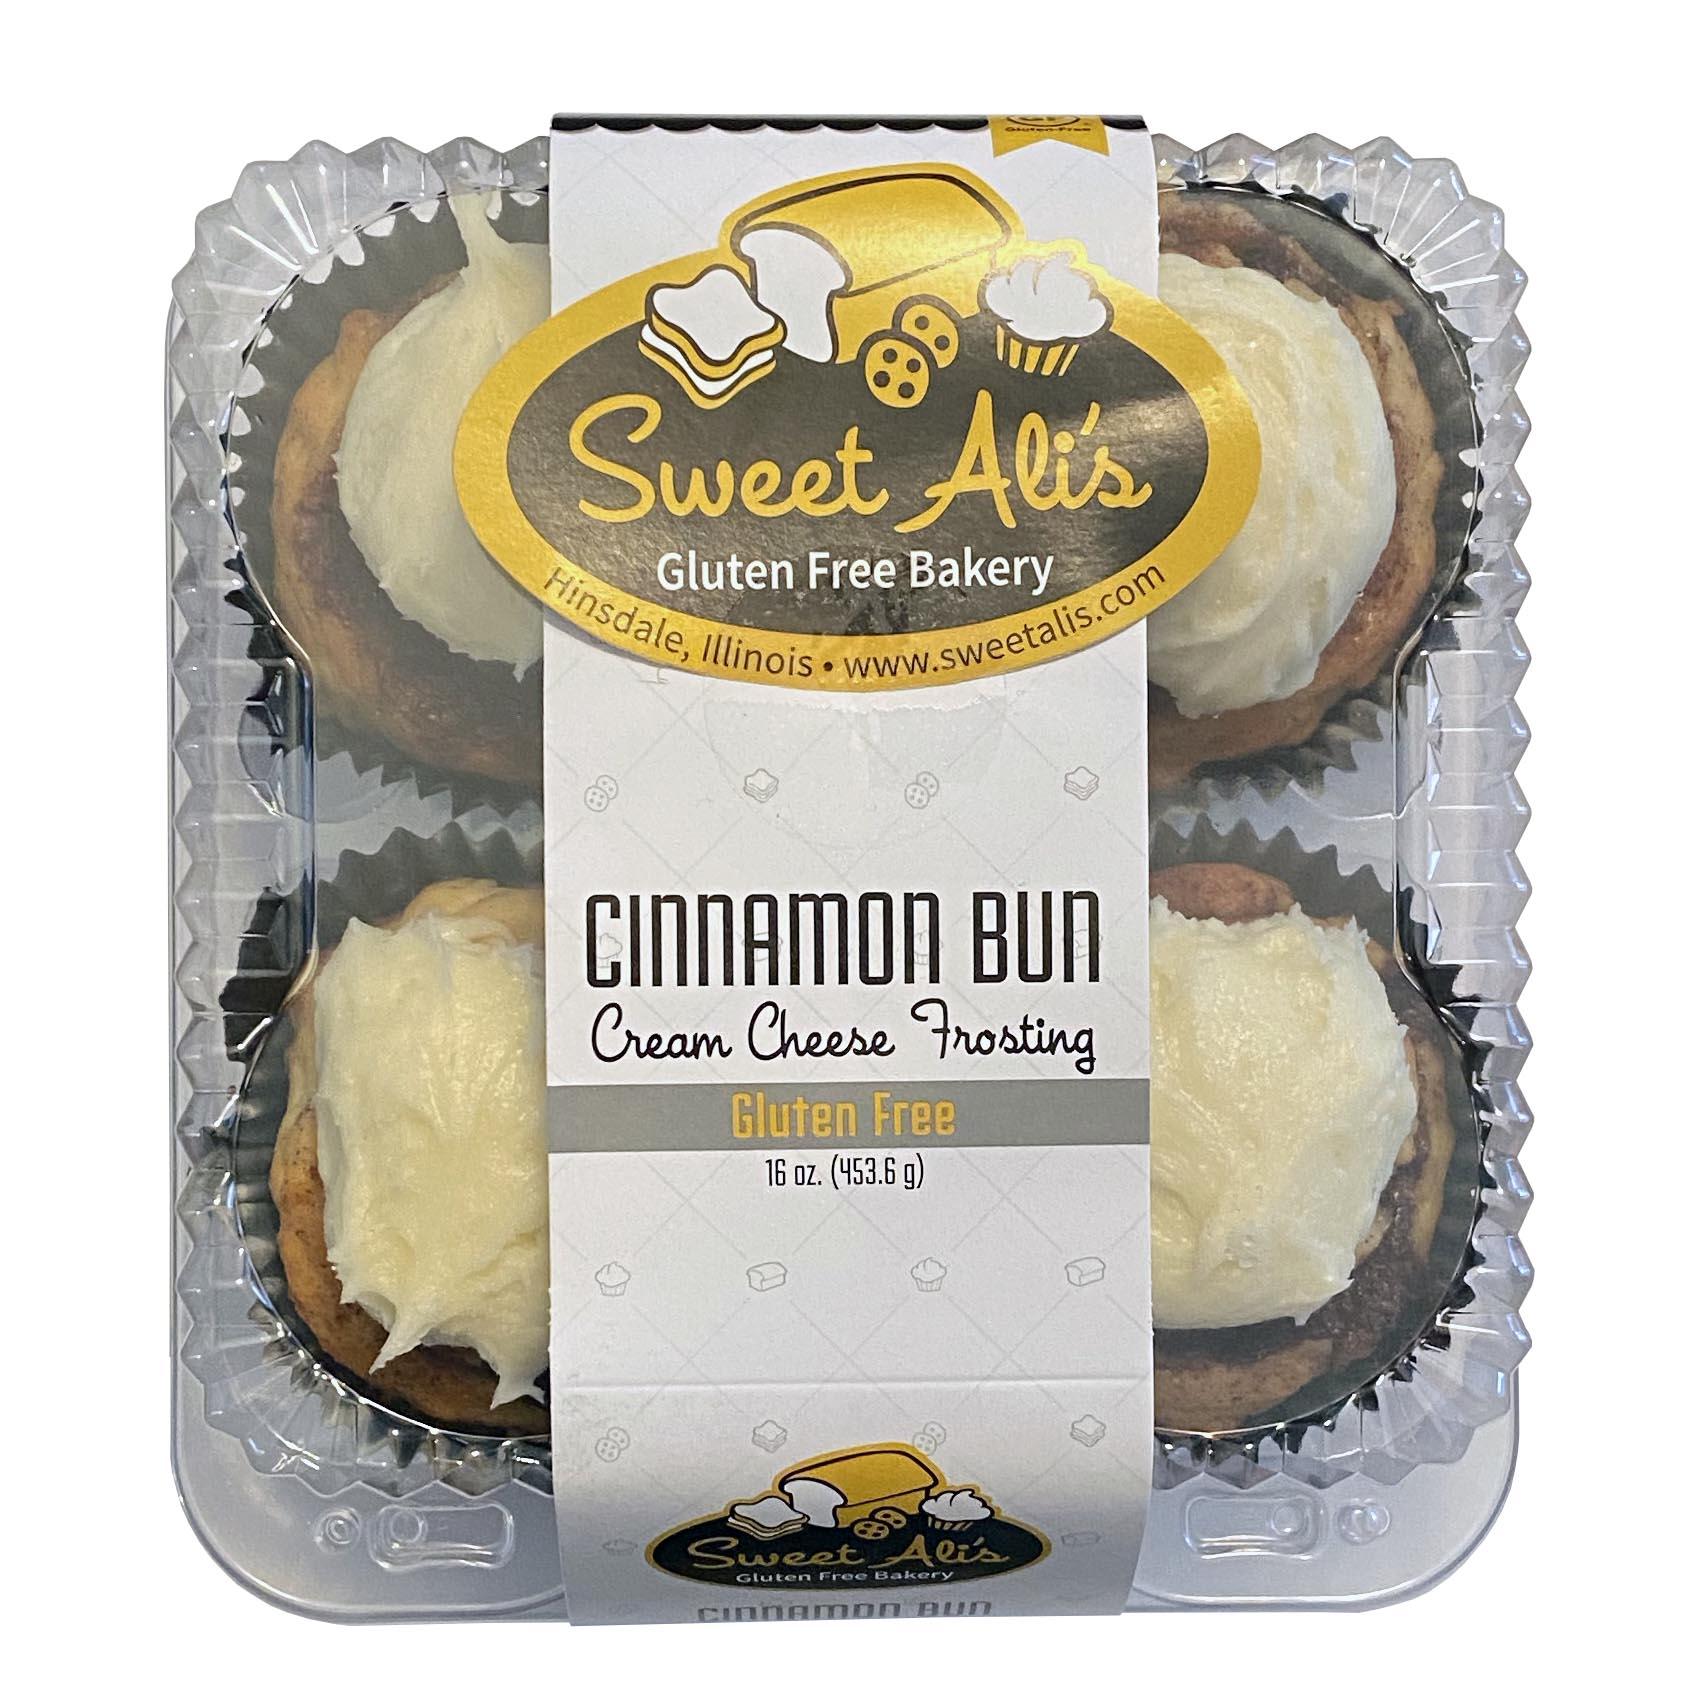 Cinnamon Buns Packaged